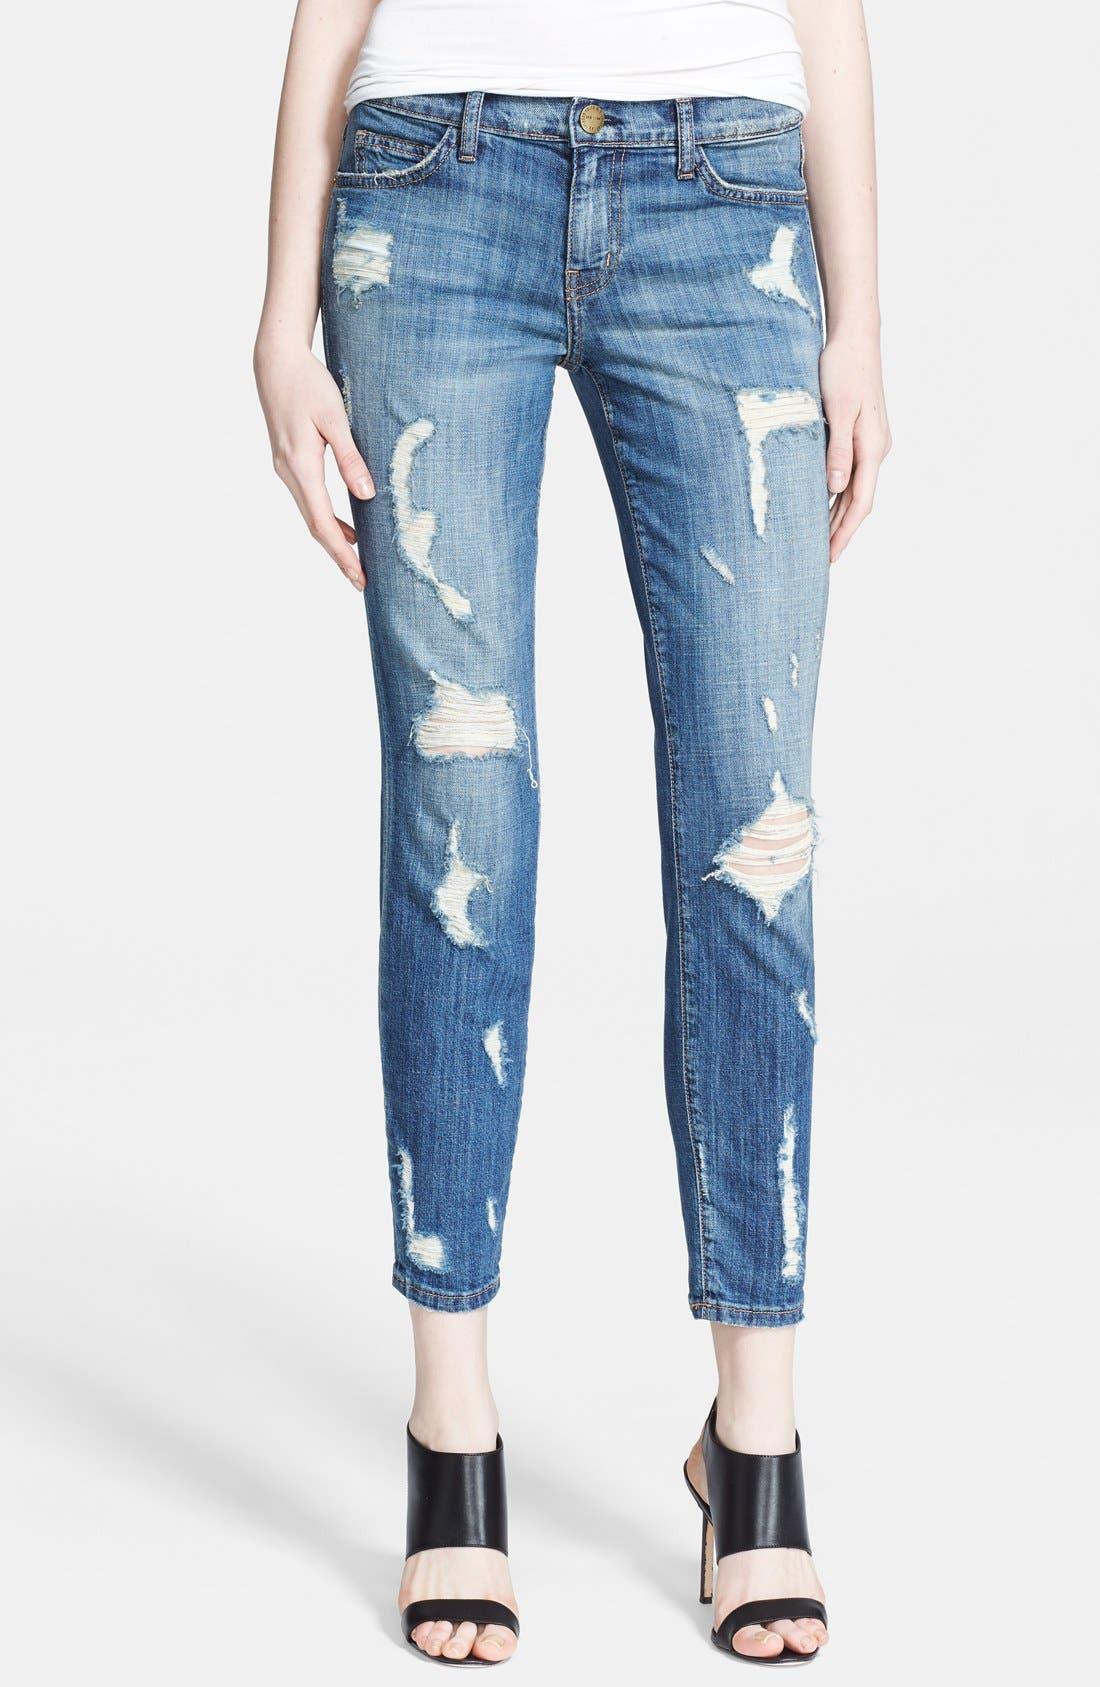 Main Image - Current/Elliott 'The Stiletto' Skinny Jeans (Jodie Shredded)